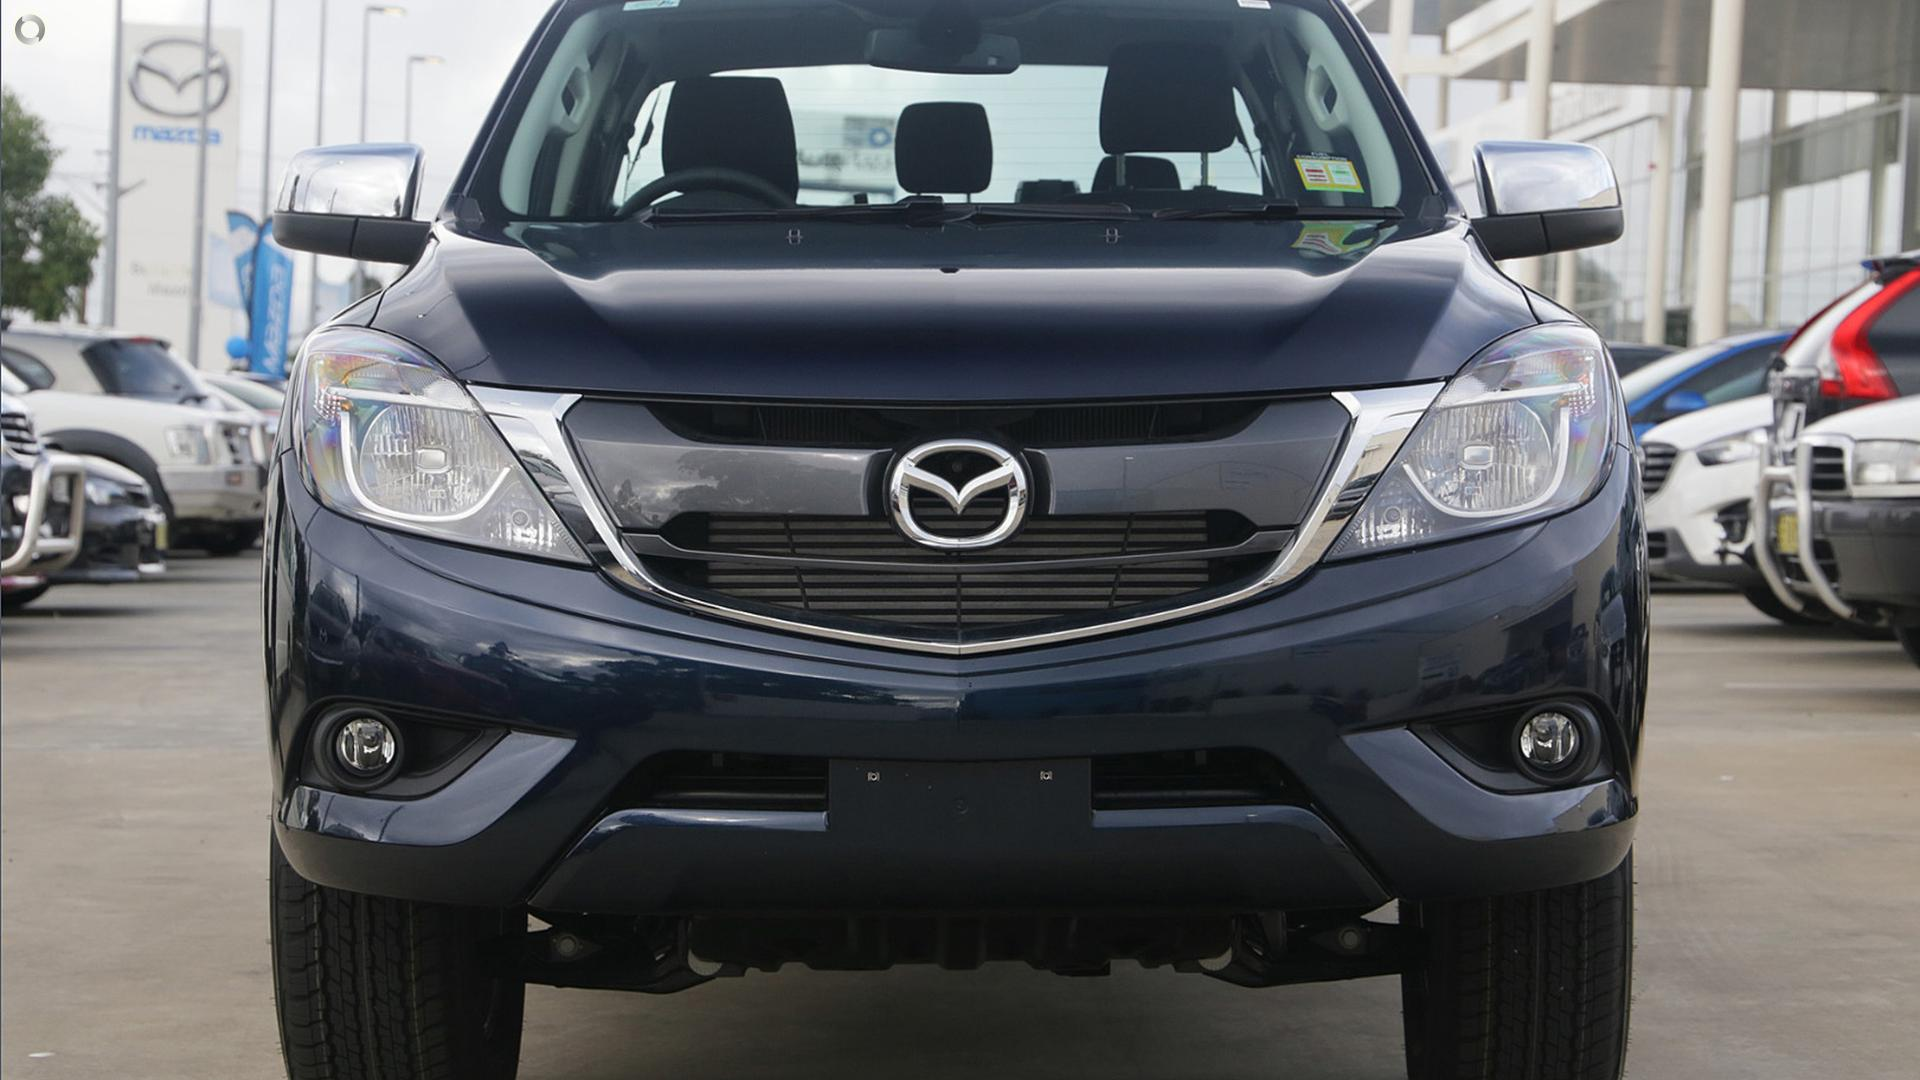 2017 Mazda Bt-50 Xtr